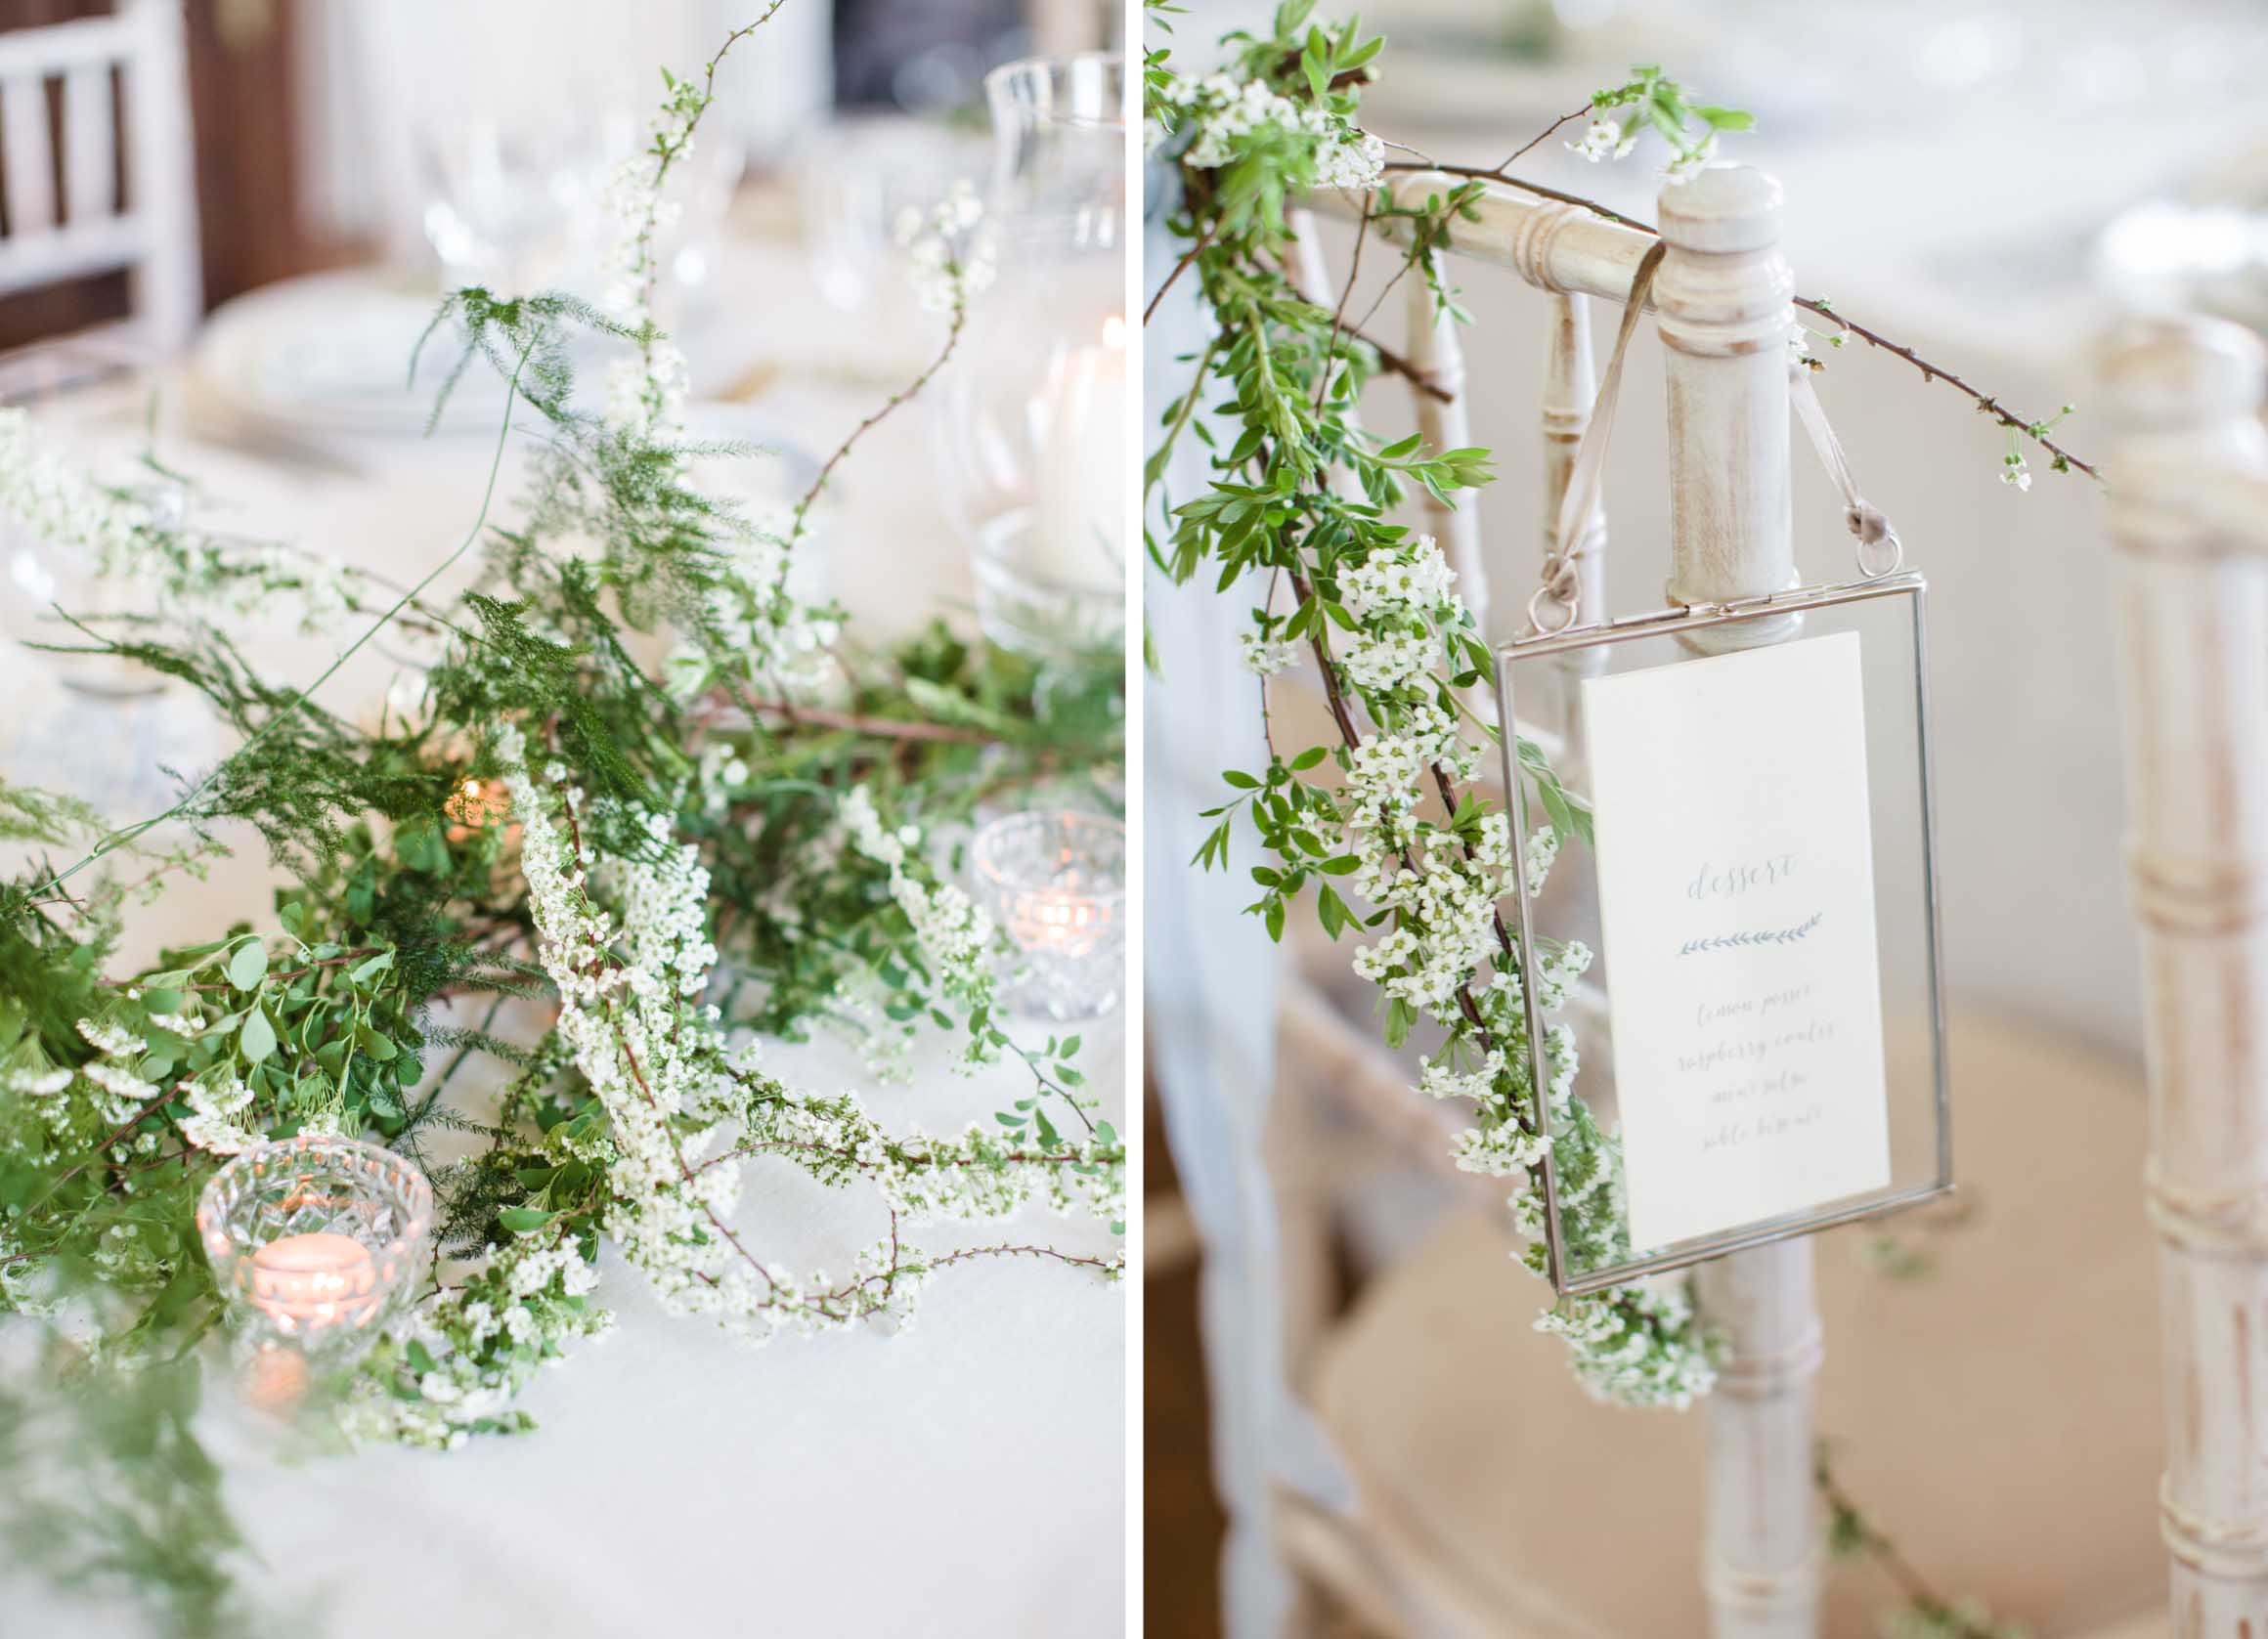 Pynes House Wedding- Amy O'Boyle Photography 2.jpg